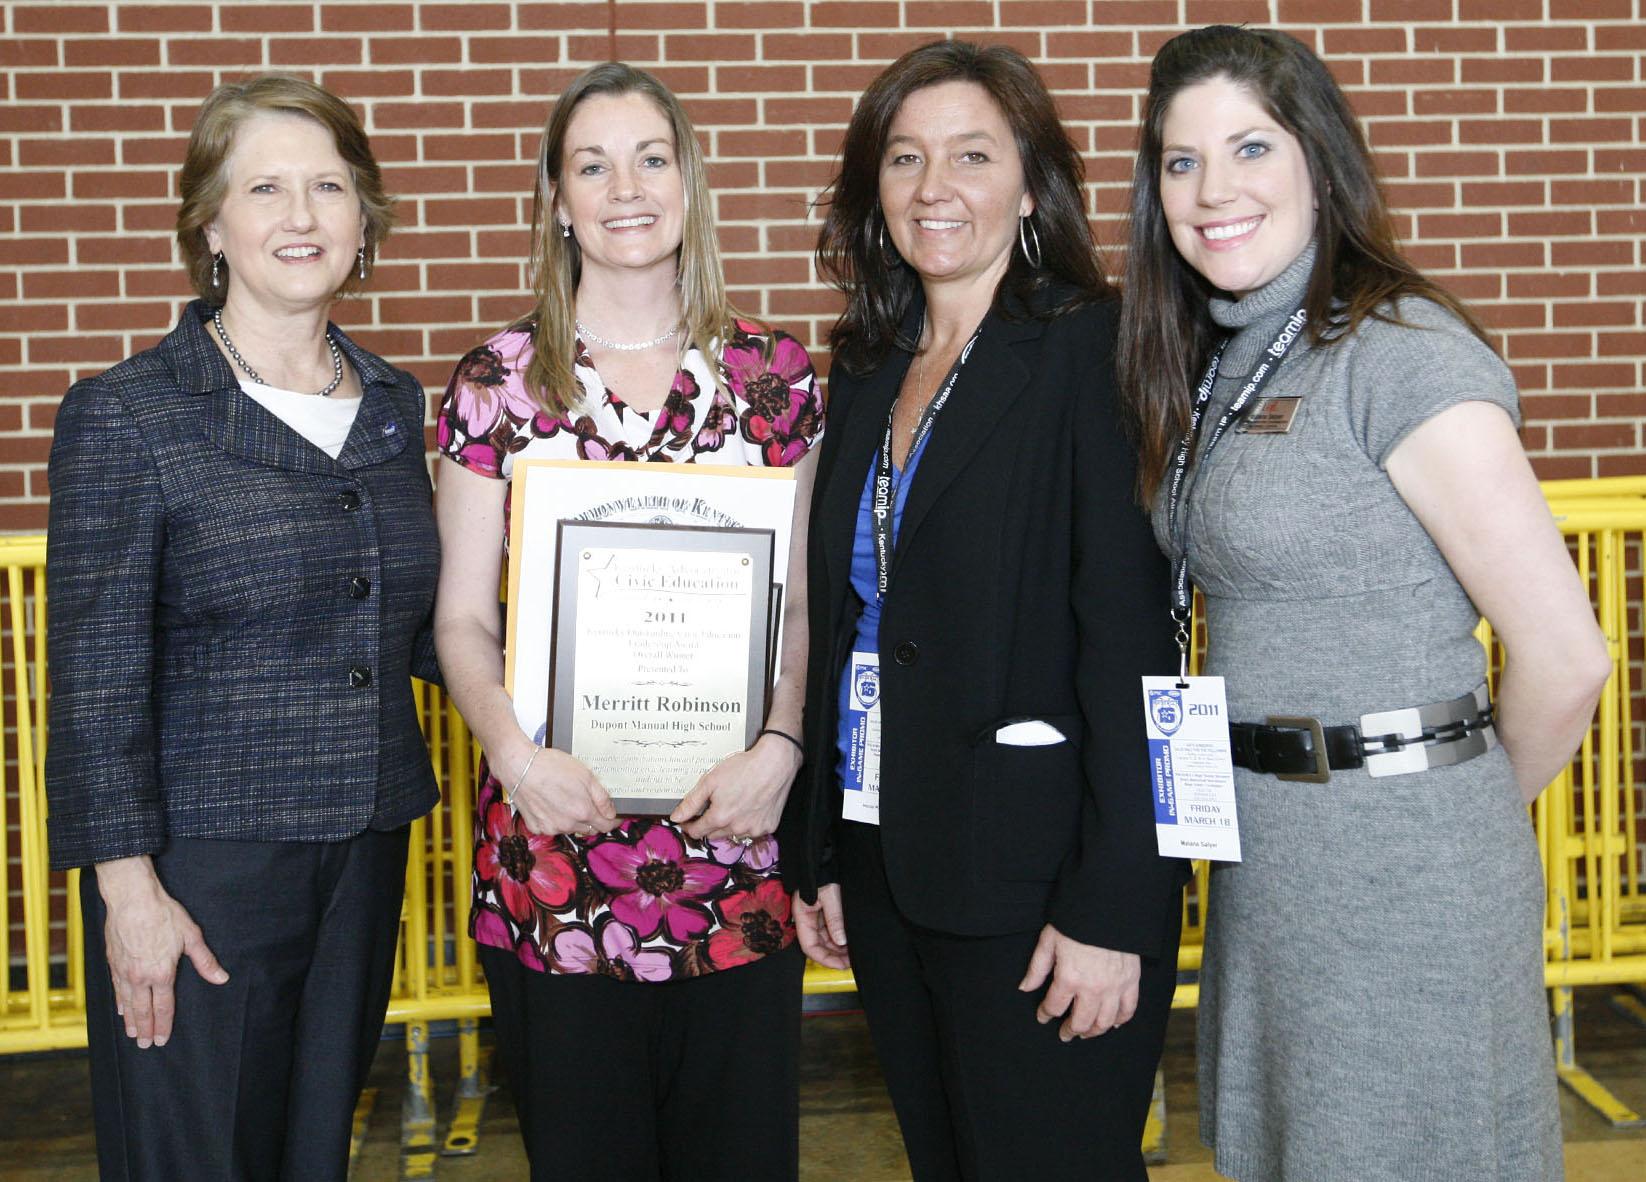 McConnell Center co-sponsors 'Outstanding Civic Education Leadership Award'